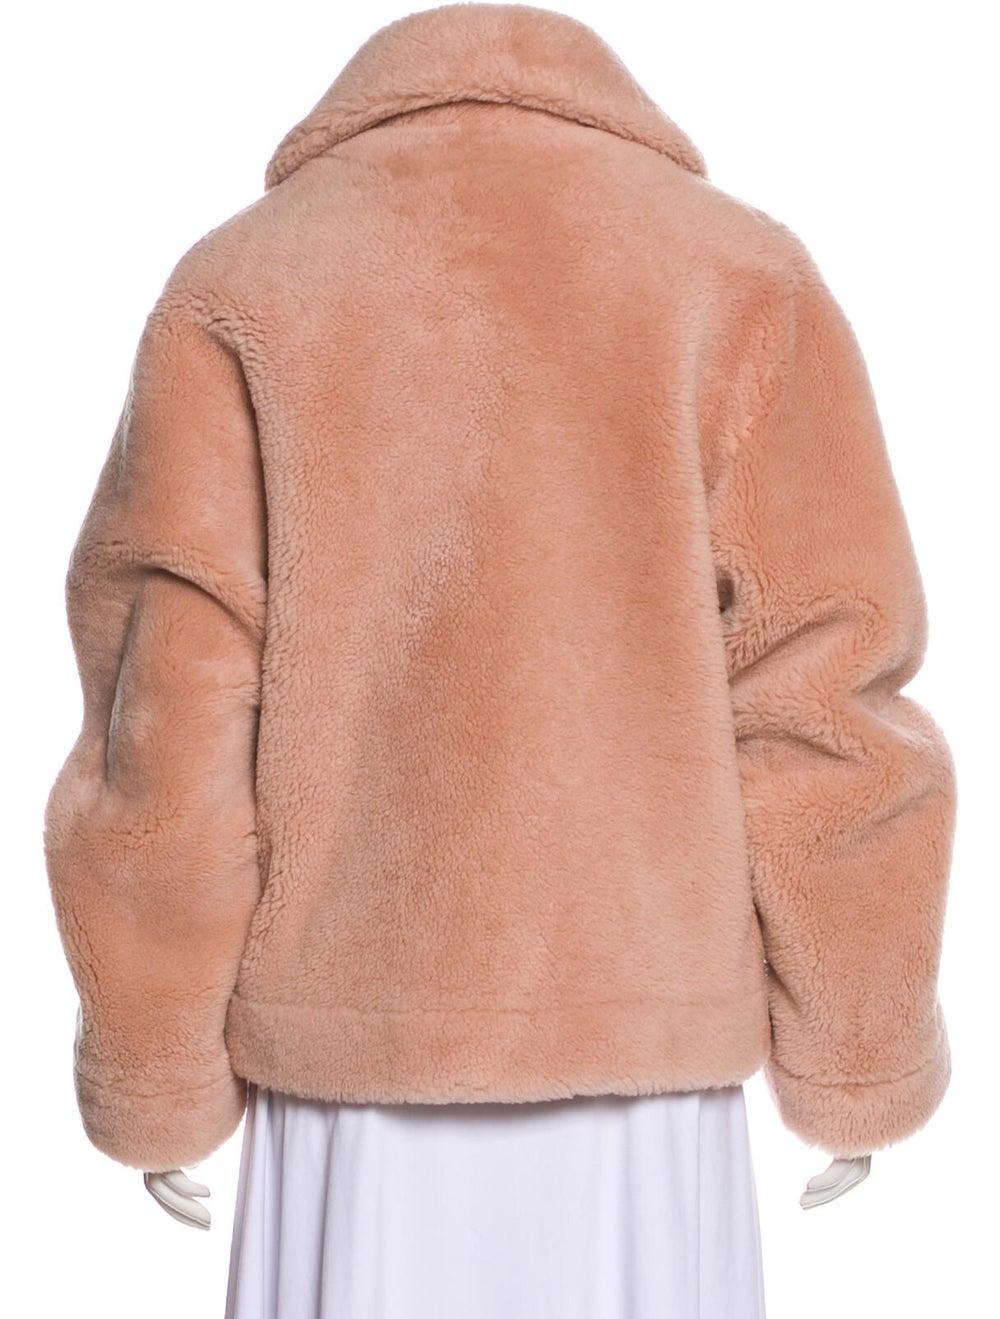 Balmain Shearling Button-Up Jacket Pink - image 3